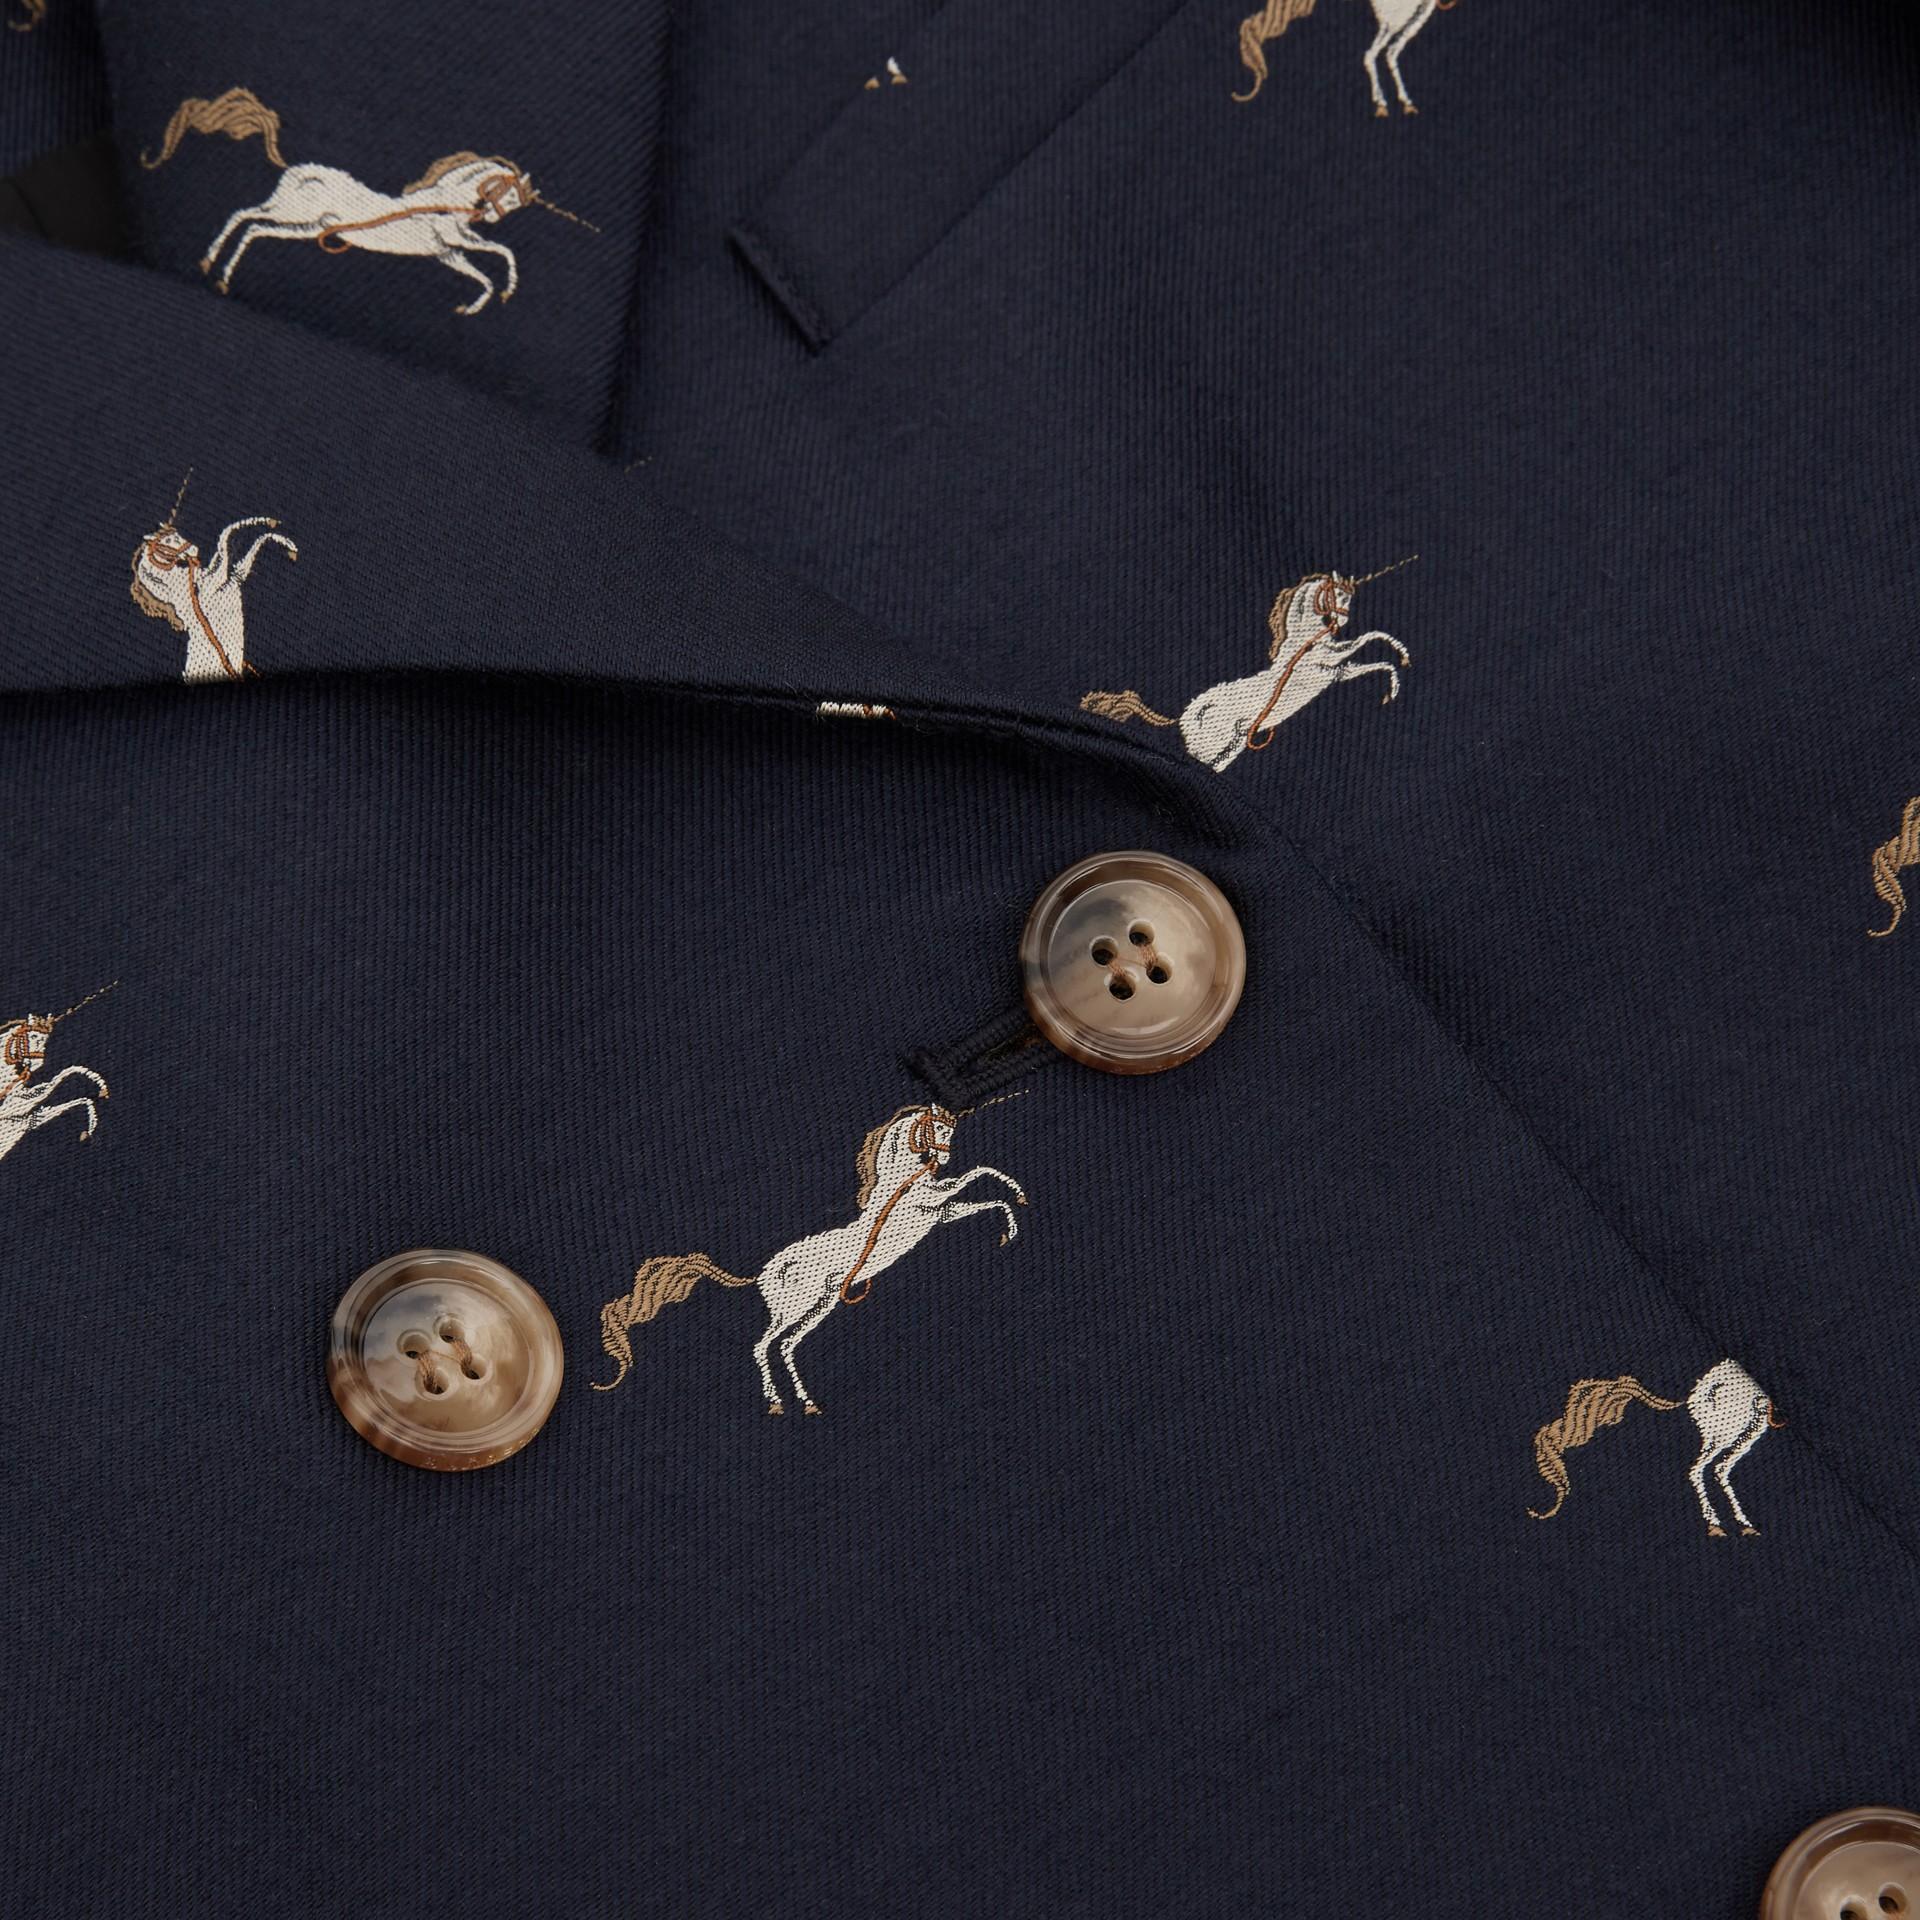 Unicorn Wool Silk Jacquard Tailored Coat in Navy   Burberry United Kingdom - gallery image 1